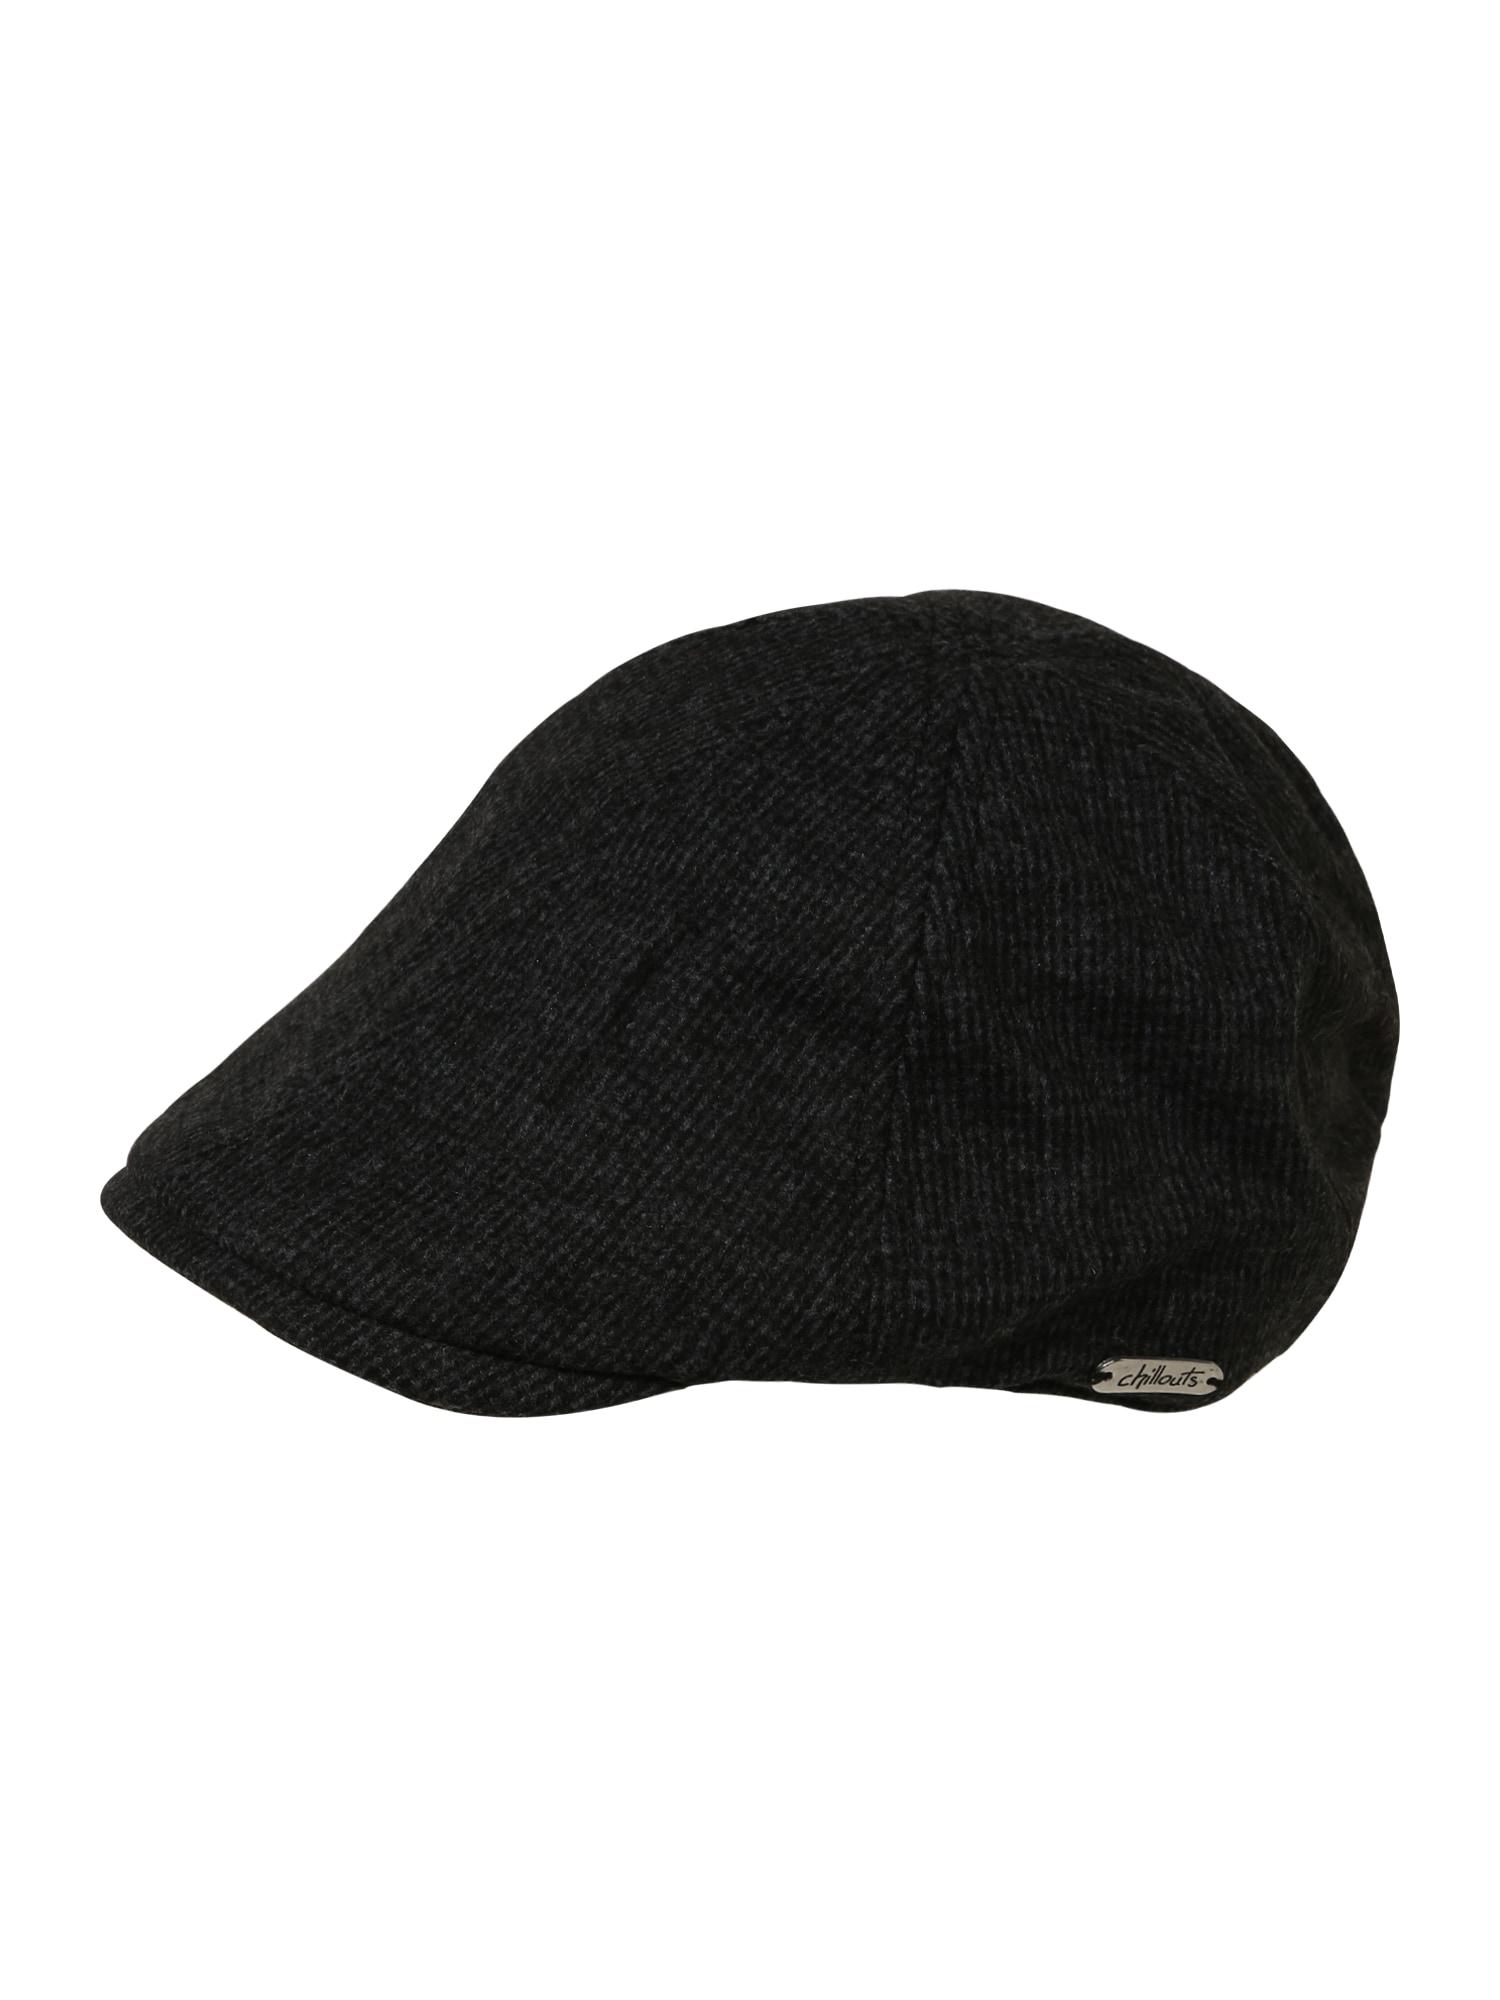 chillouts Megzta kepurė margai juoda